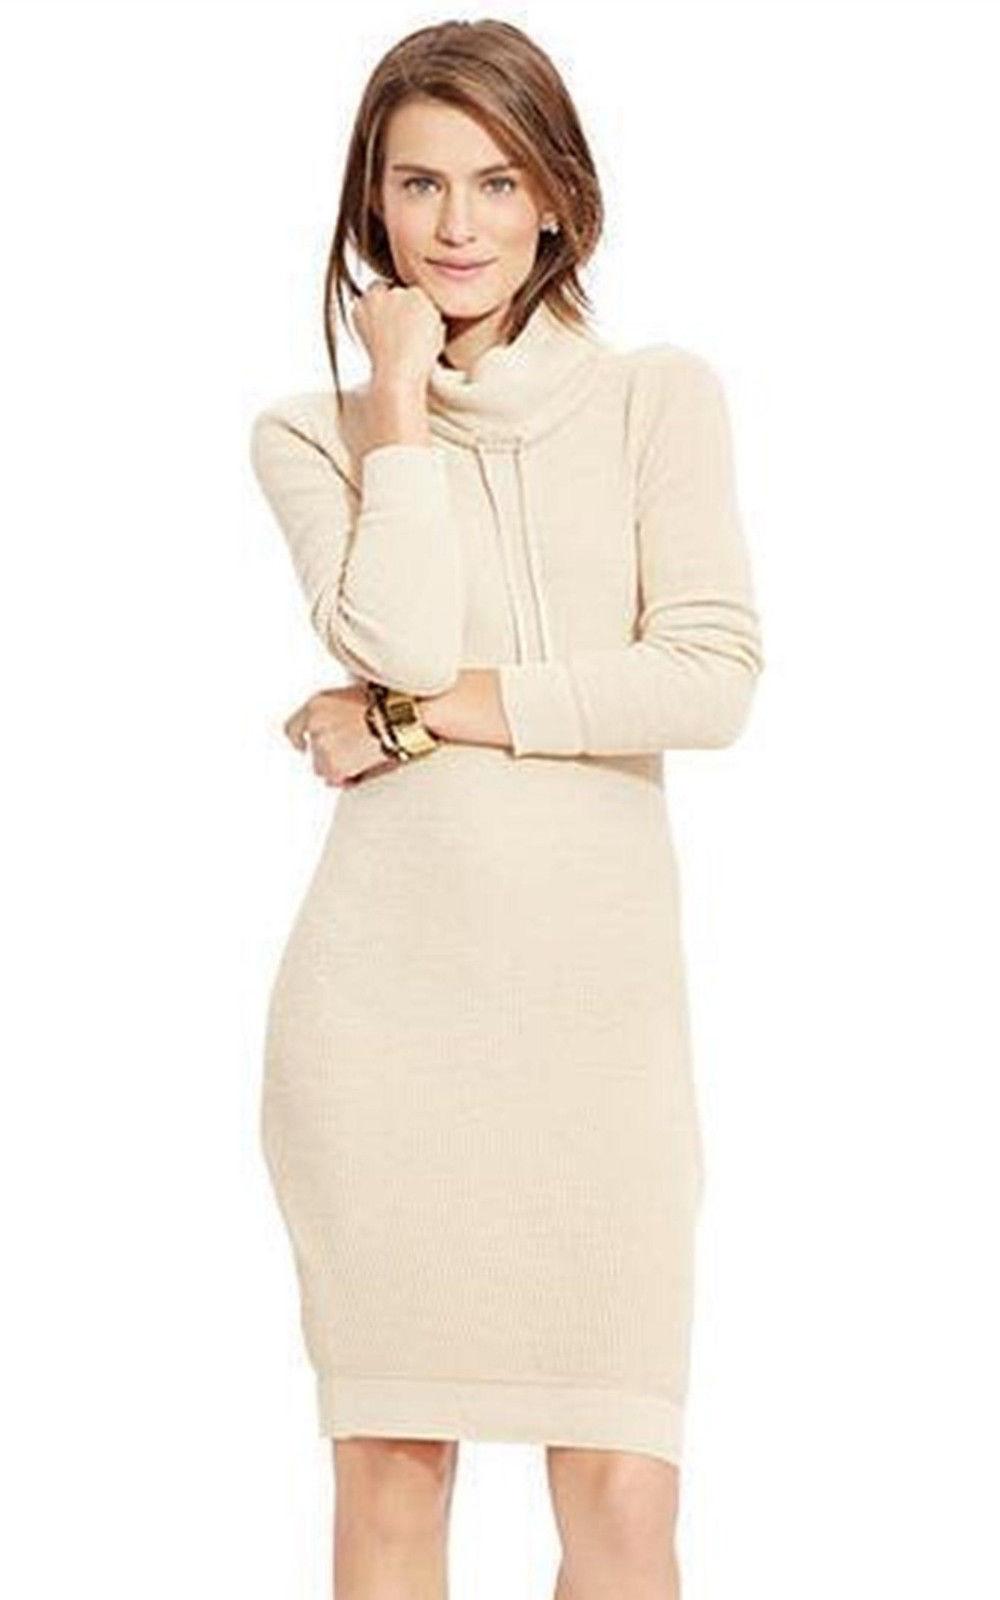 LRL Lauren Jeans Co. by Ralph Lauren Cotton Knit Women's Sweater Dress Small